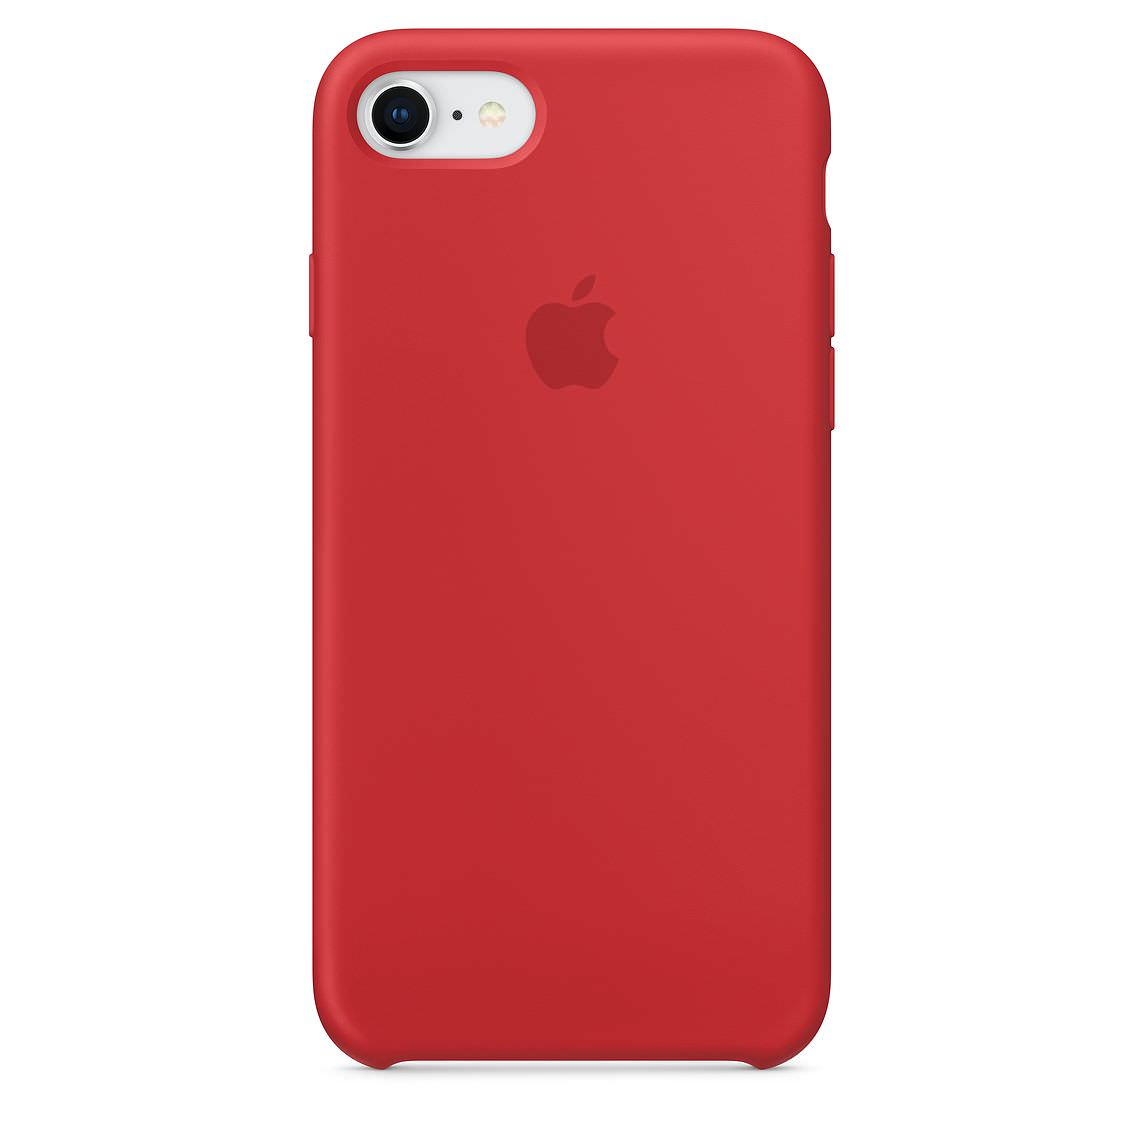 Apple silikónový obal pre iPhone SE 2020 - červený 1